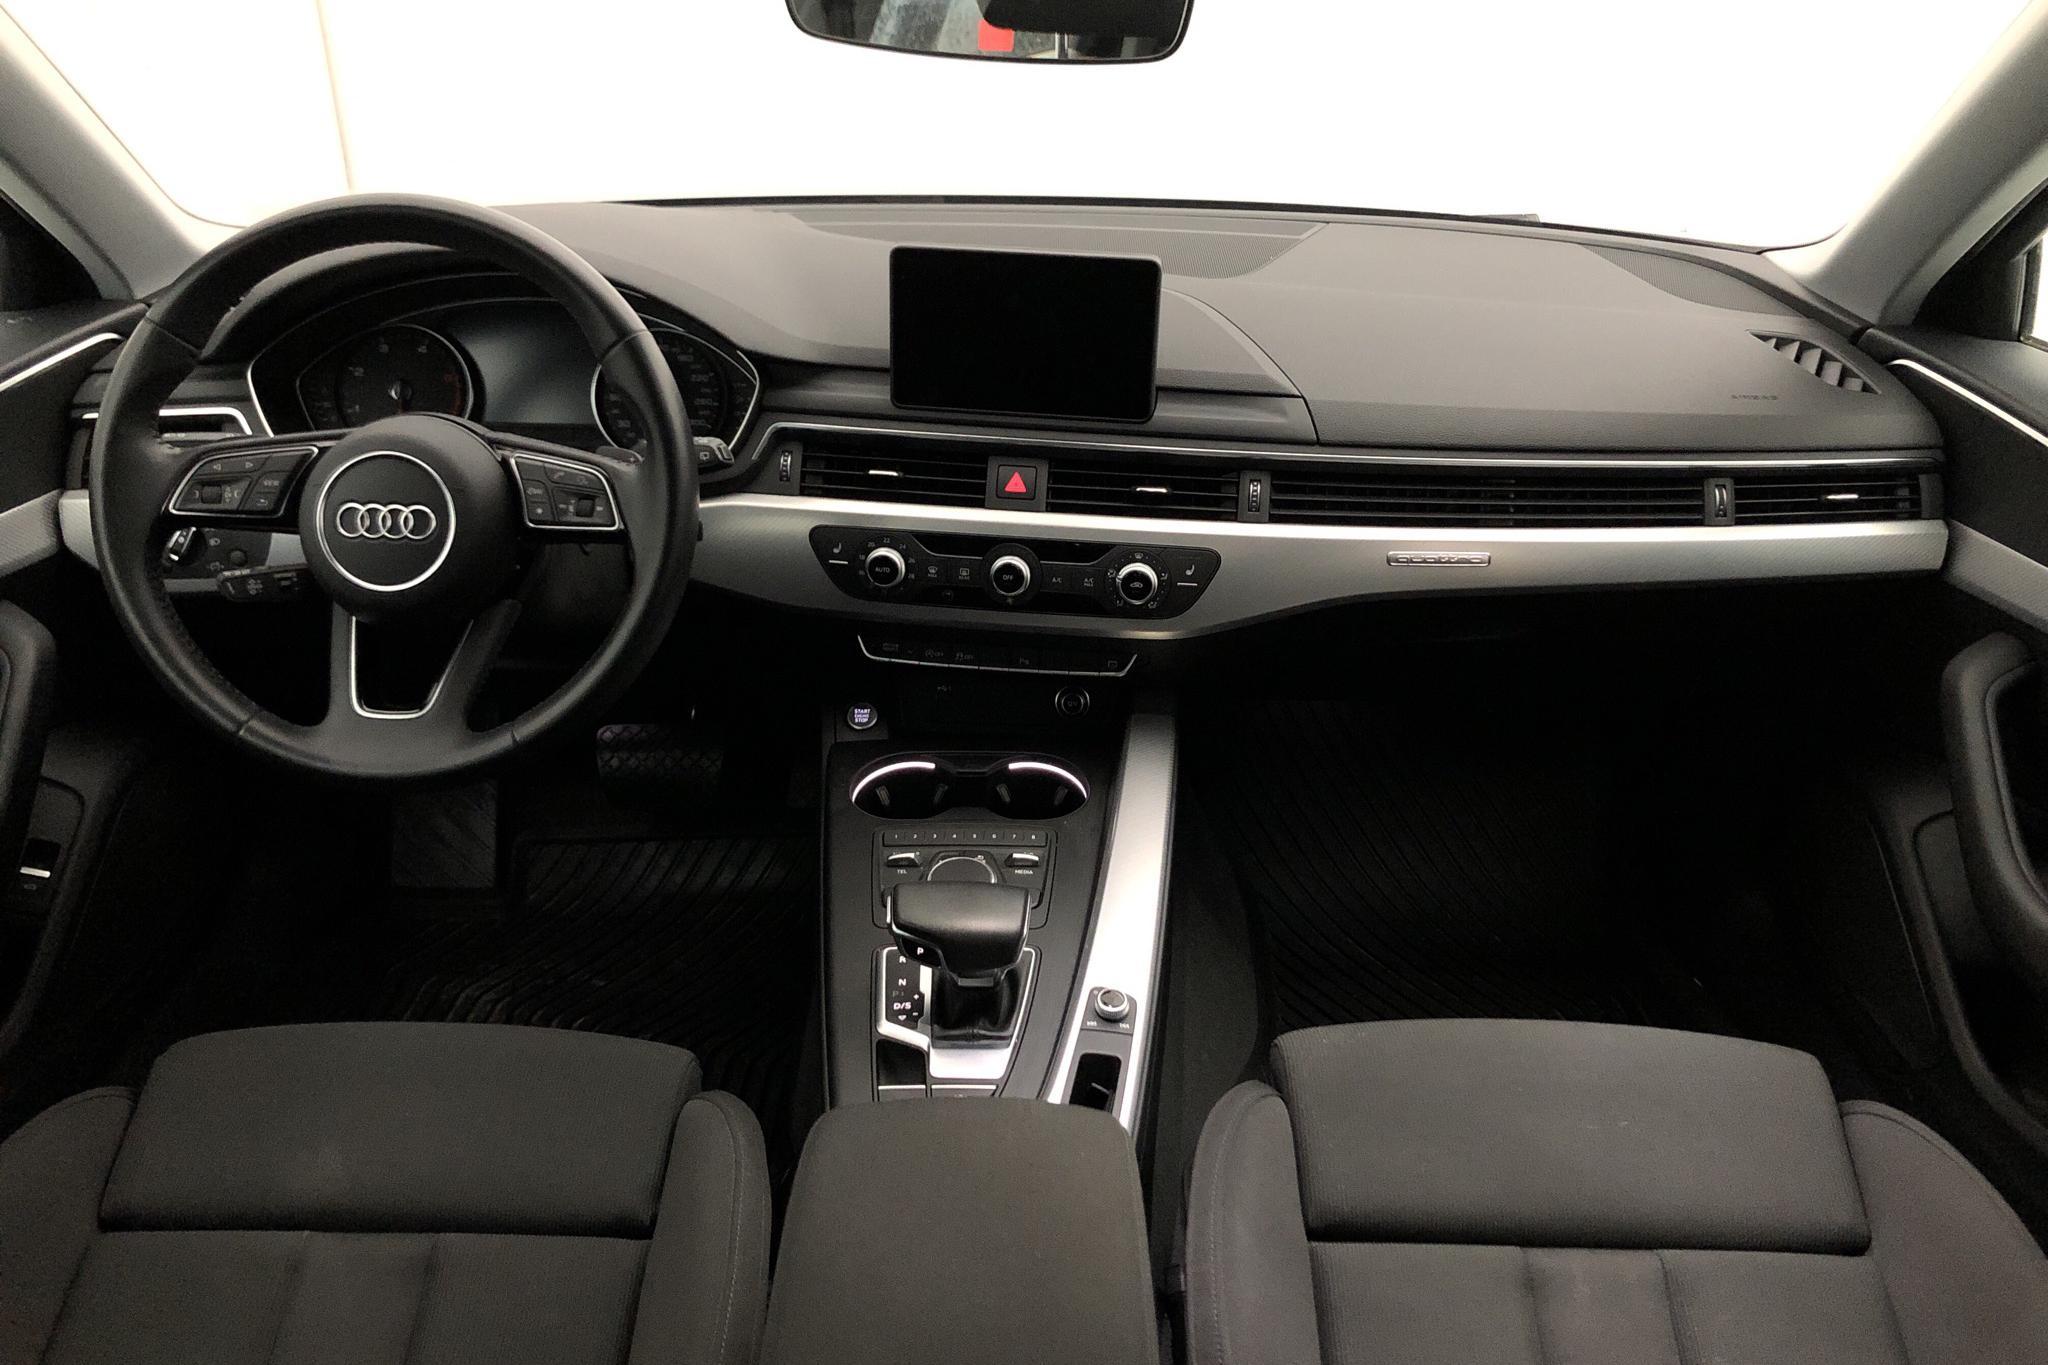 Audi A4 Avant 40 TDI quattro (190hk) - 38 740 km - Automatic - silver - 2019